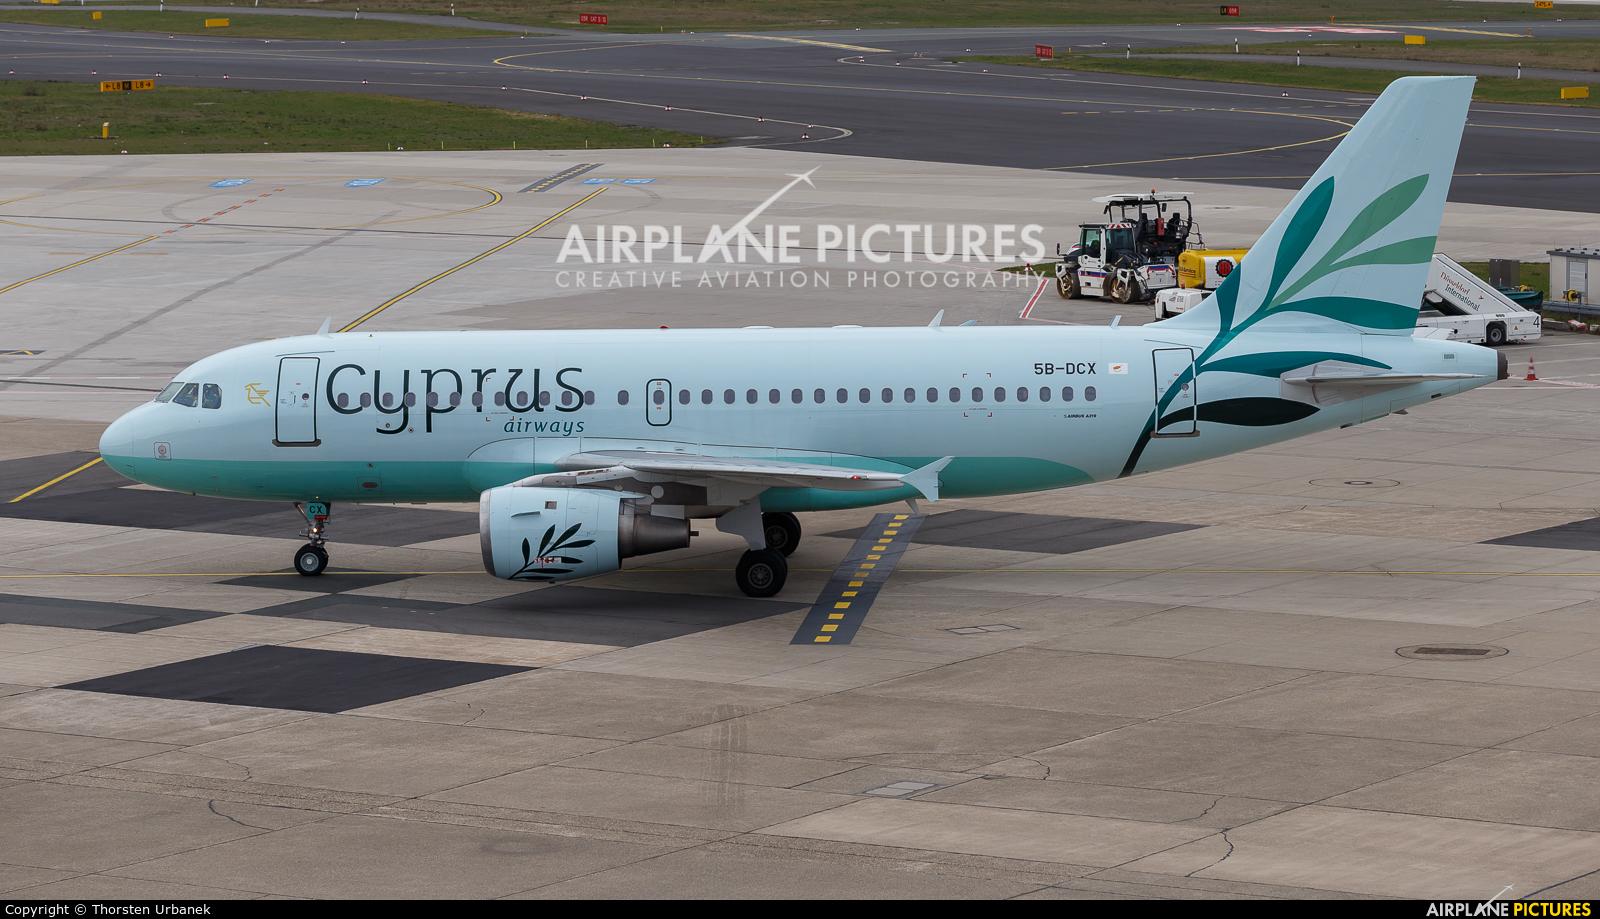 Cyprus Airways 5B-DCX aircraft at Düsseldorf